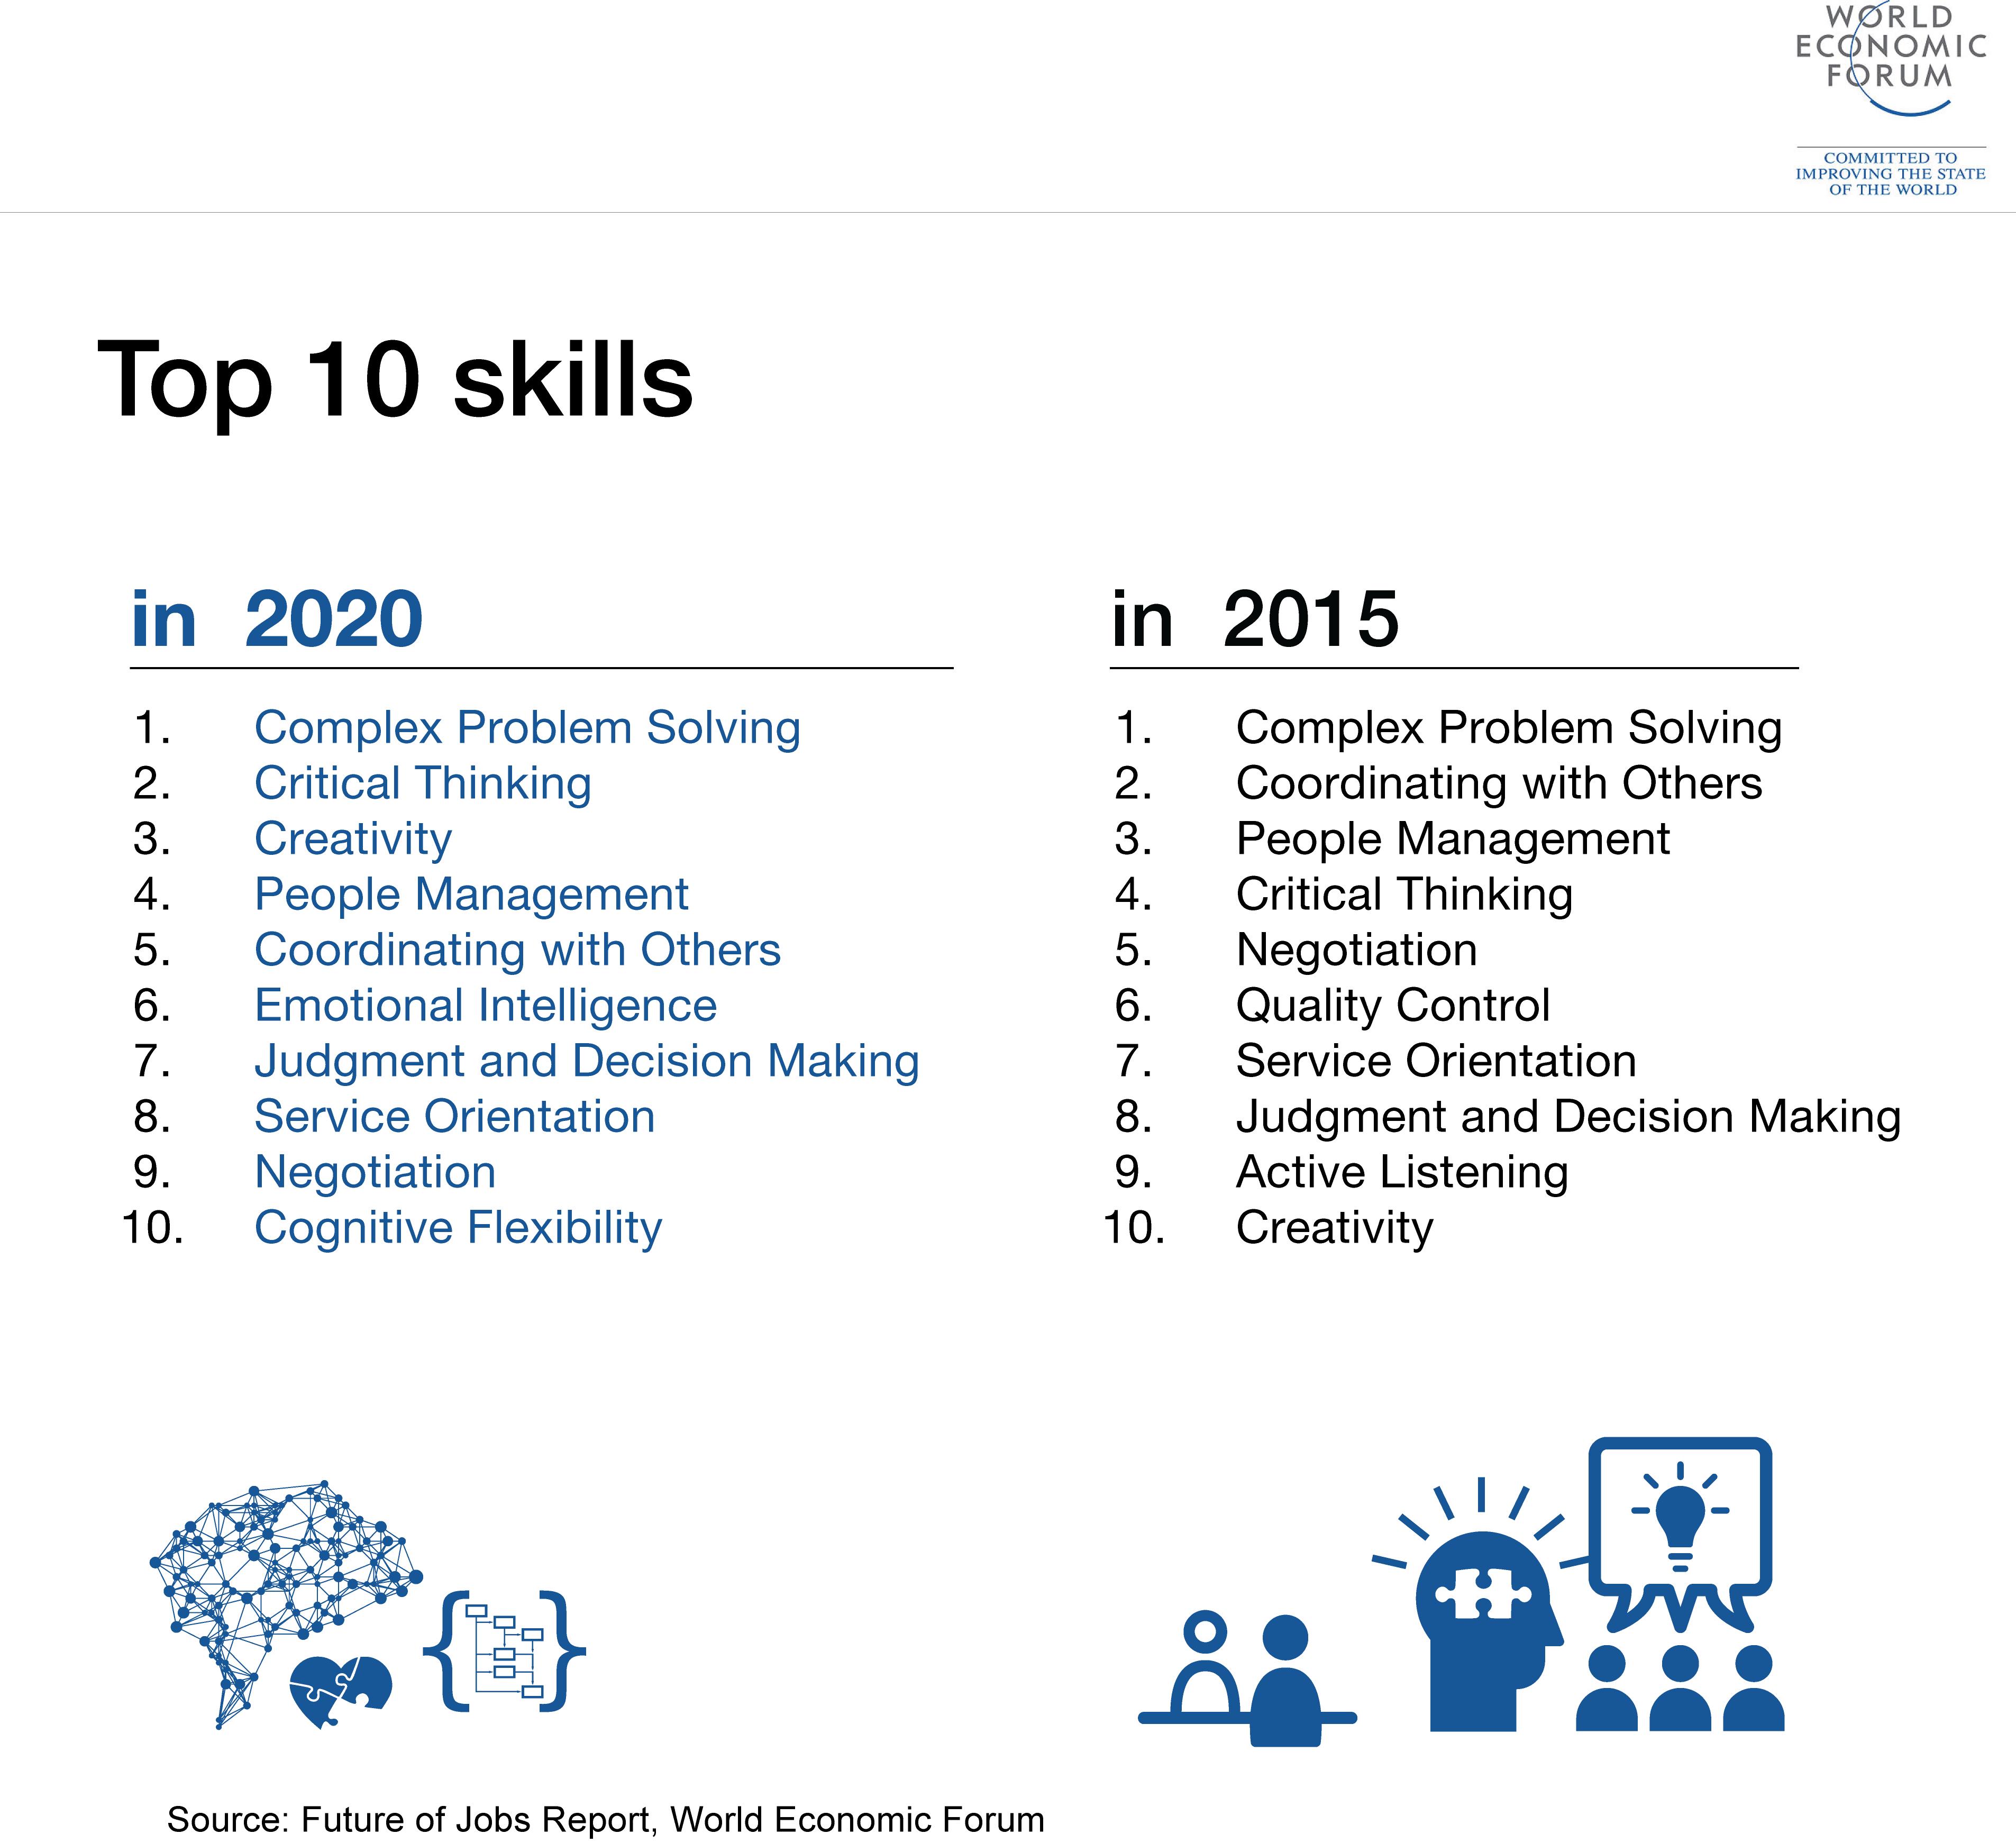 The 10 skills